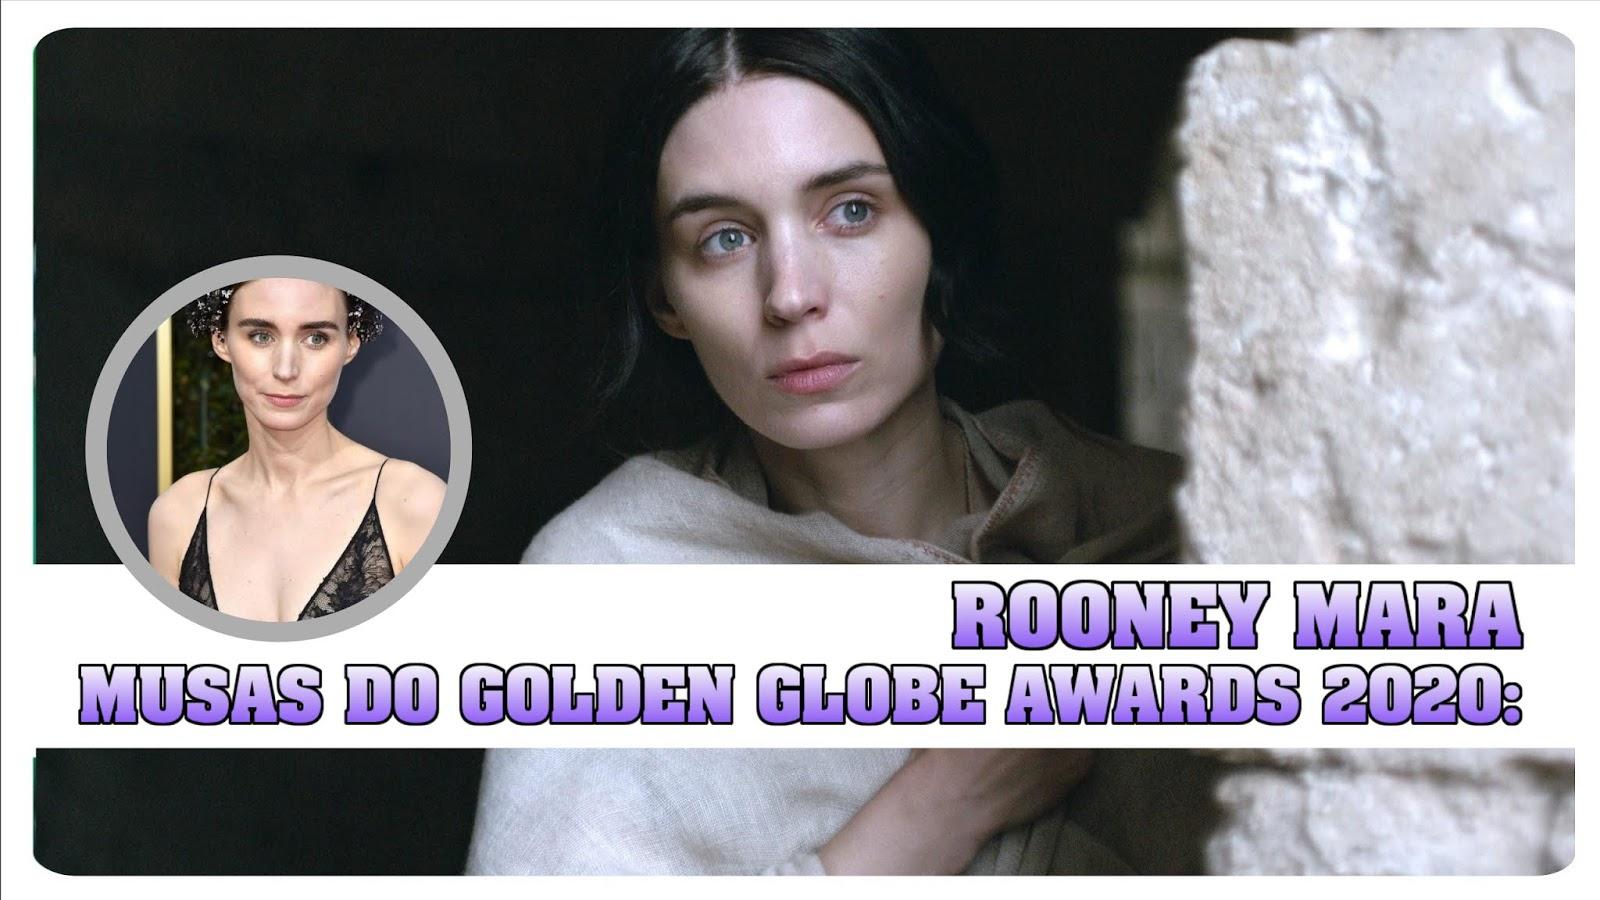 rooney-mara-golden-globe-awards